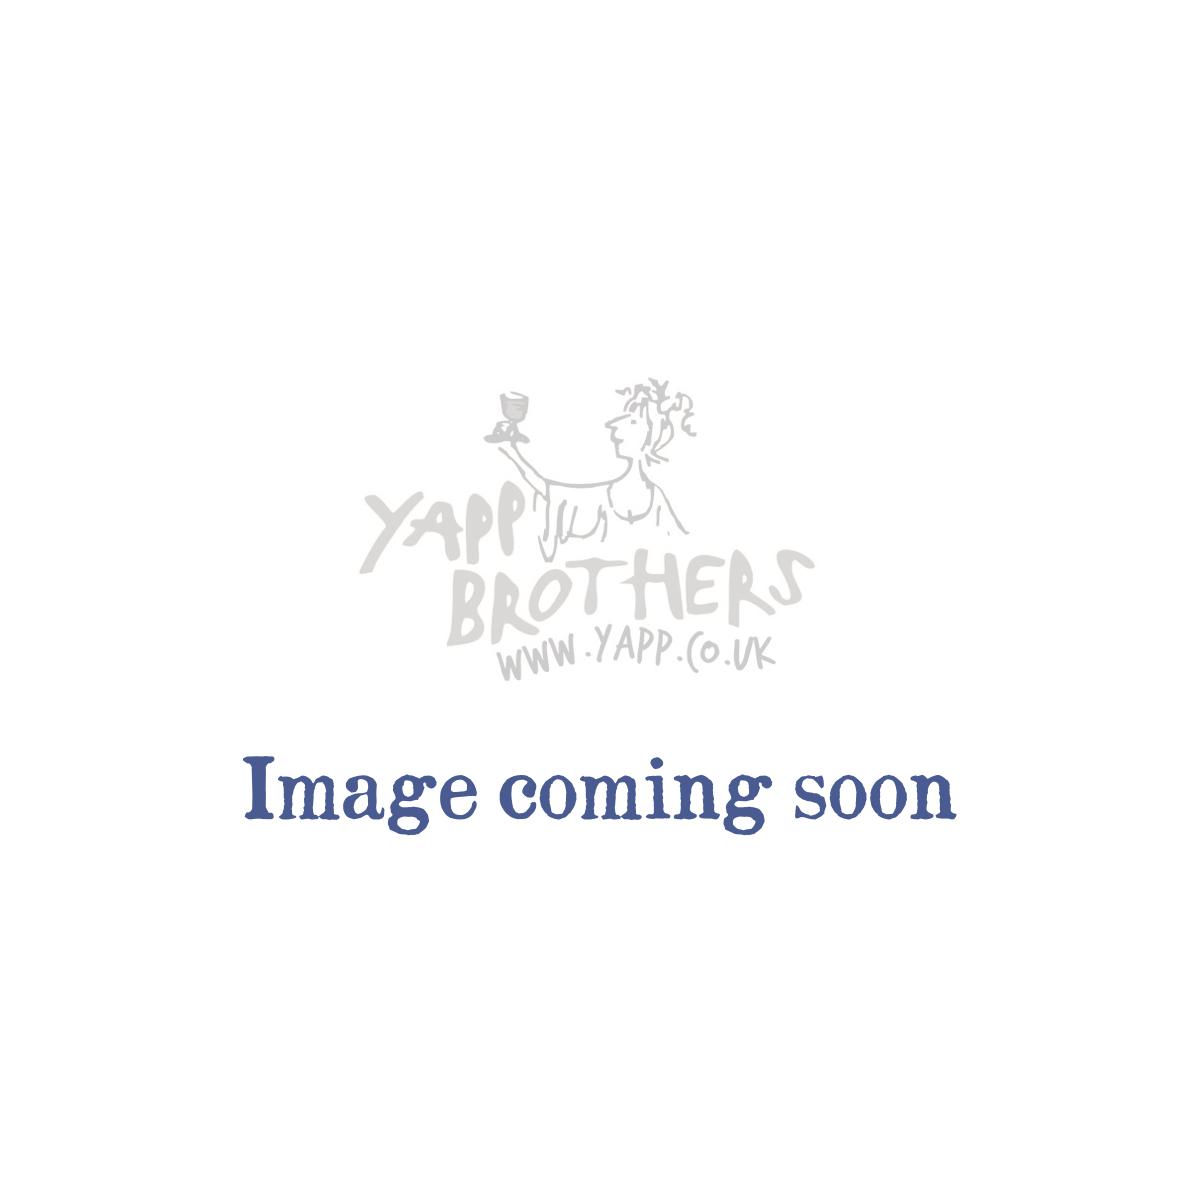 Bourgogne Chardonnay: Domaine Bruno Colin 2019 - Bottle Rear Label